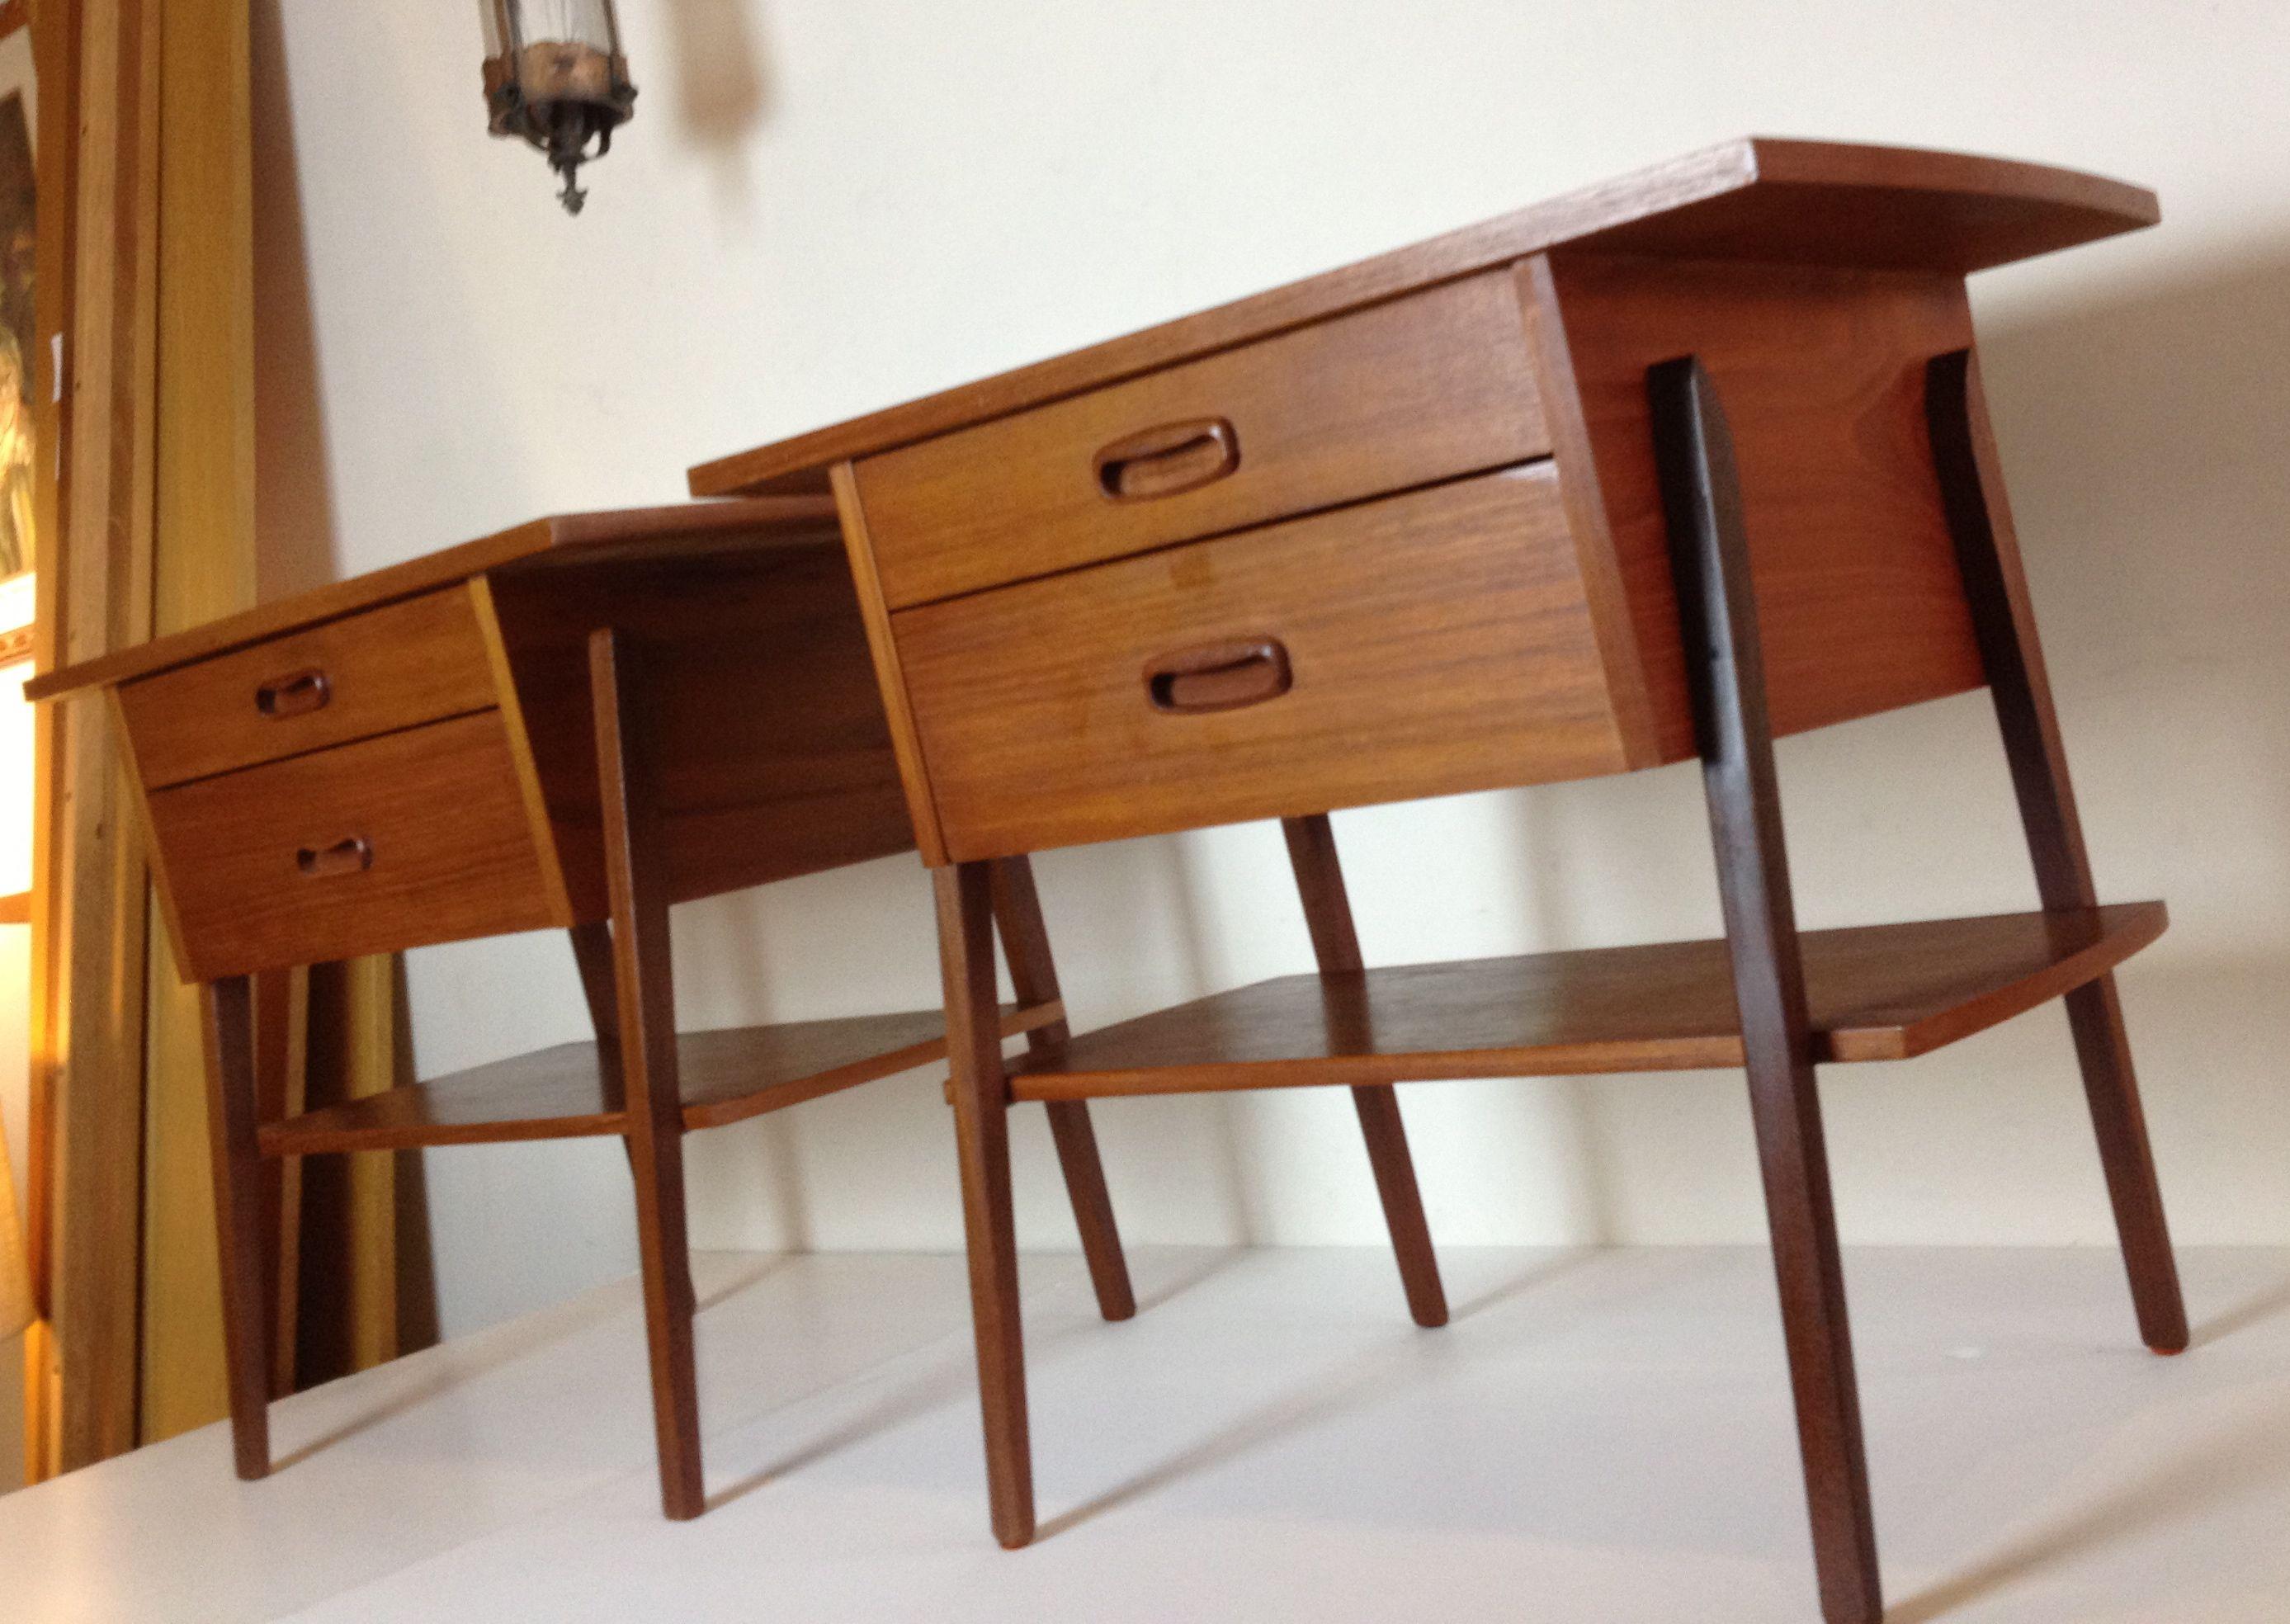 Danish modern furniture - Danish Teak Bedsides Vintage Mid Century Modern Furniture Pintere